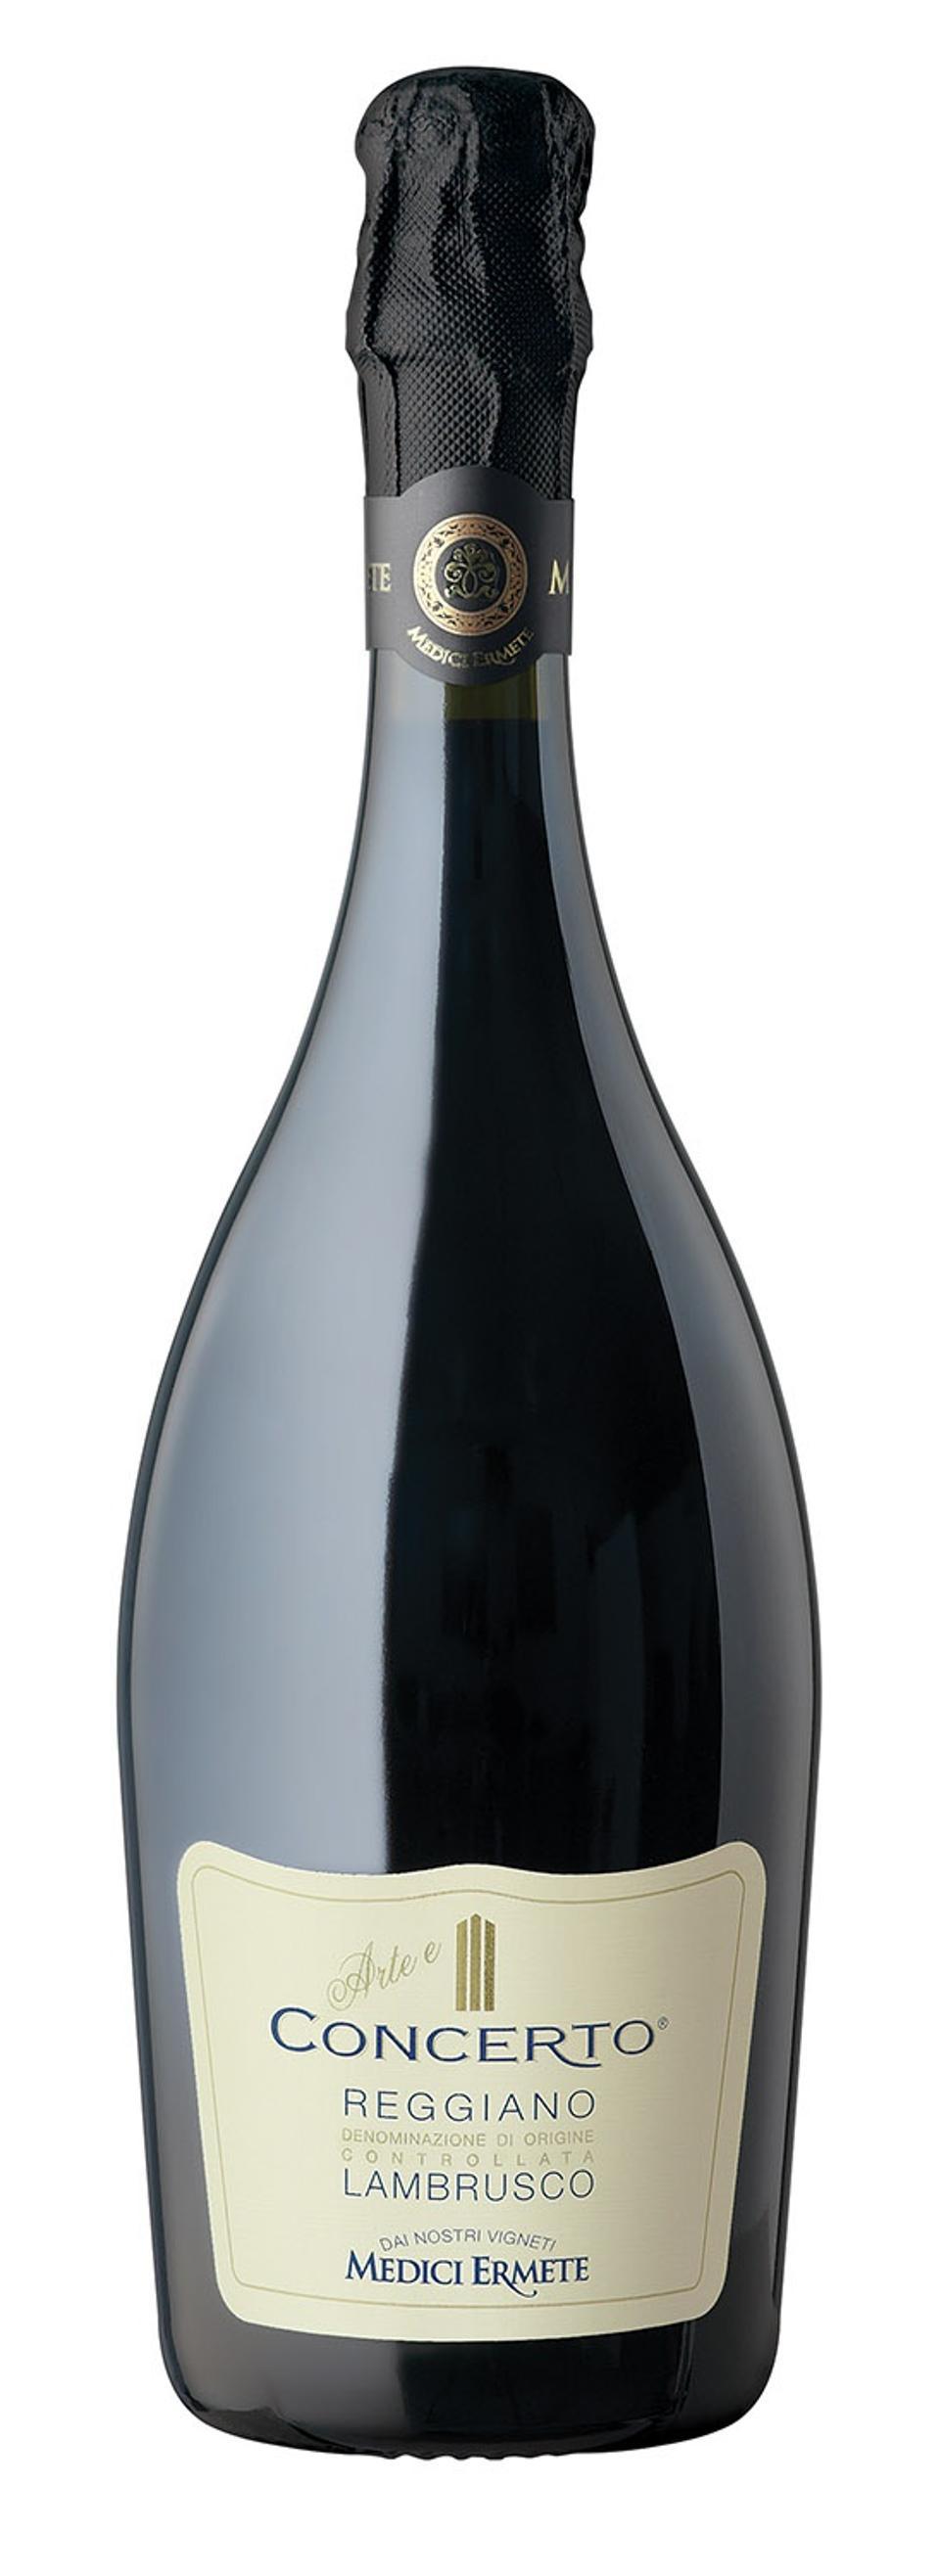 Bottle of Medici Ermete Concerto Reggiano Lambrusco